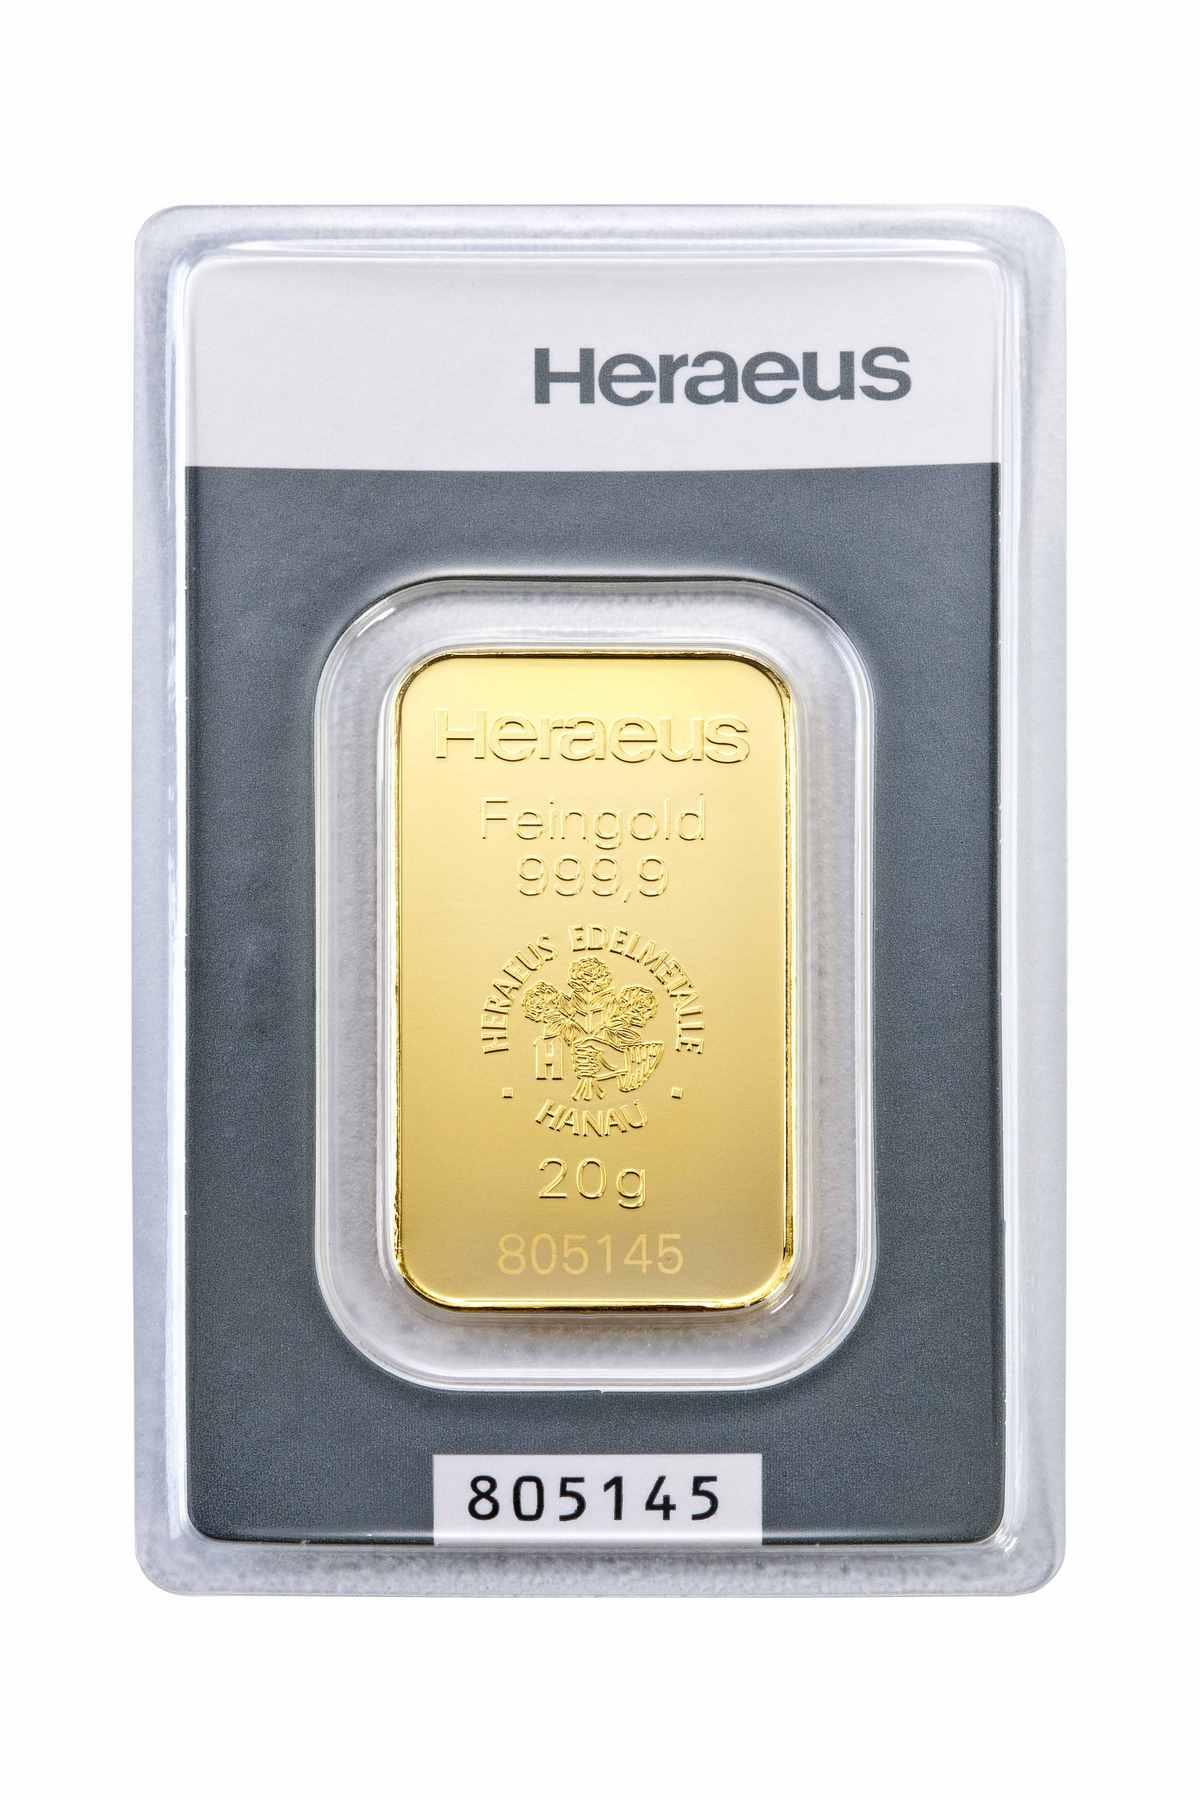 20 g Kinebar Heraeus  Goldbarren Neuware